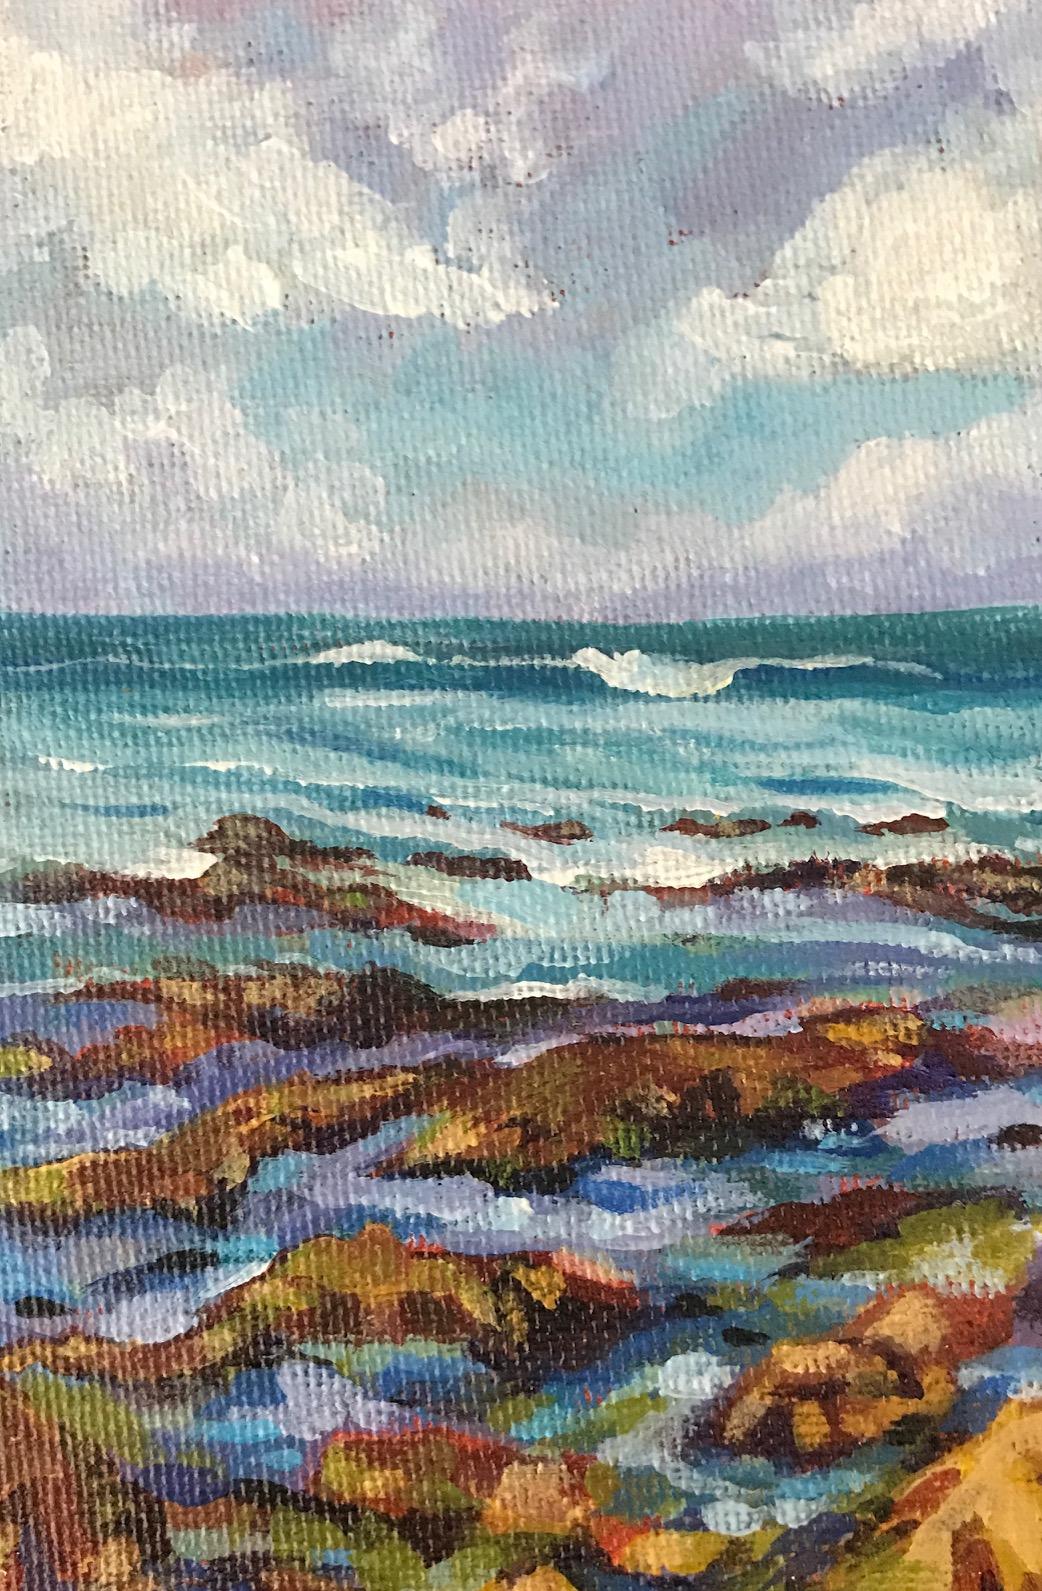 """A Distant Wave"", 4"" x 6"", acrylic on canvas board"